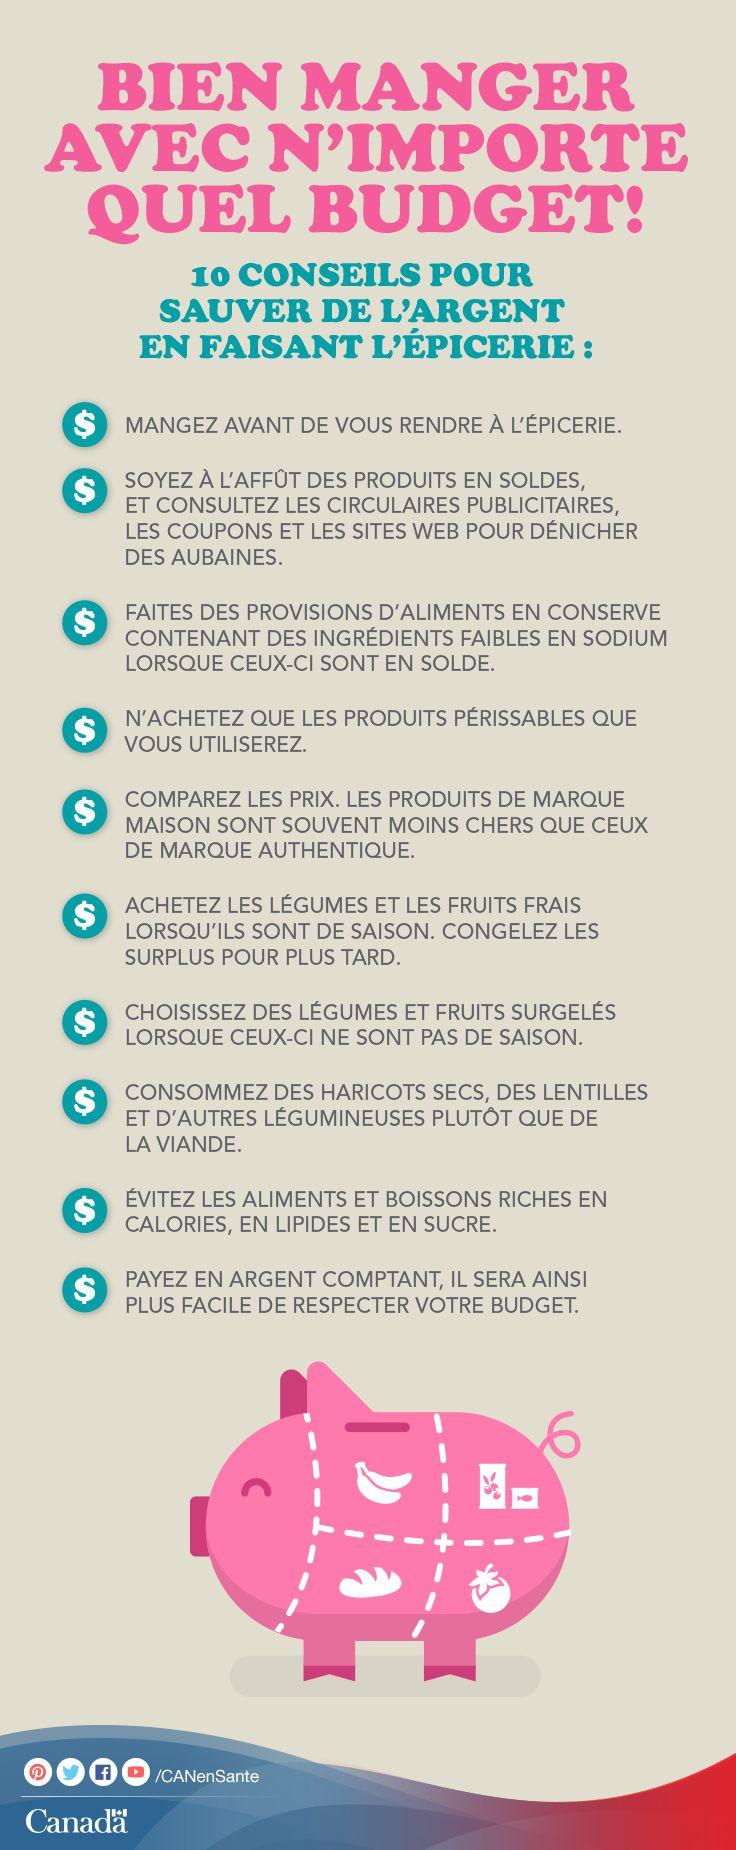 Apprenez comment bien manger peu importe le budget :  http://www.canadiensensante.gc.ca/eating-nutrition/healthy-eating-saine-alimentation/shopping-epicerie-fra.php?_ga=1.100487962.525080773.1393857104&utm_source=pinterest_hcdns&utm_medium=social&utm_content=June16_grocerytips_FR&utm_campaign=social_media_14